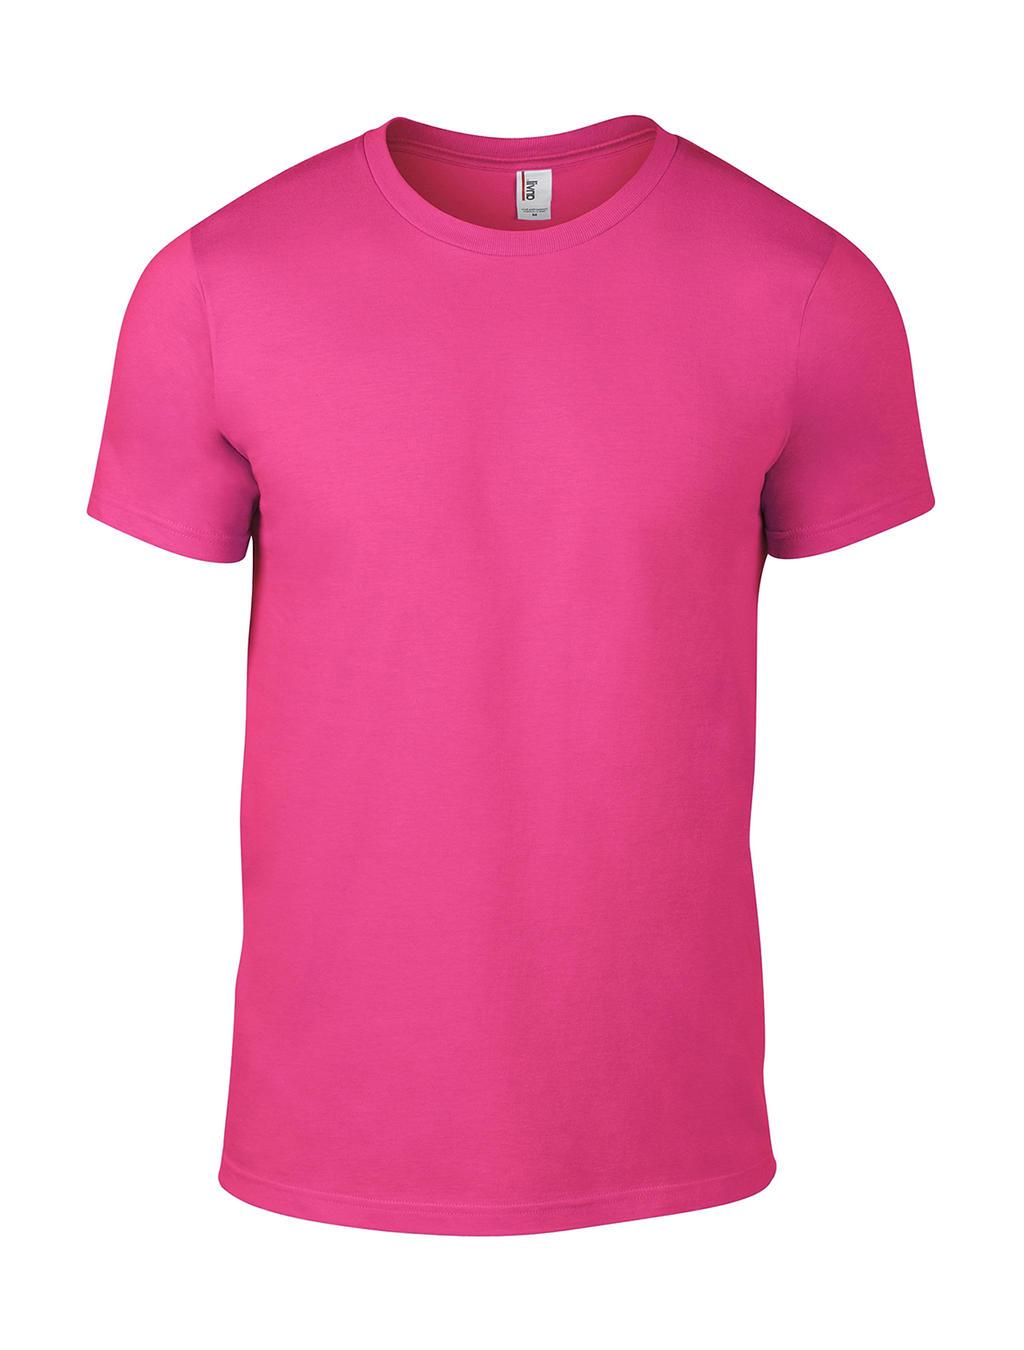 neonfarbige t shirts individuell mit namen und foto. Black Bedroom Furniture Sets. Home Design Ideas